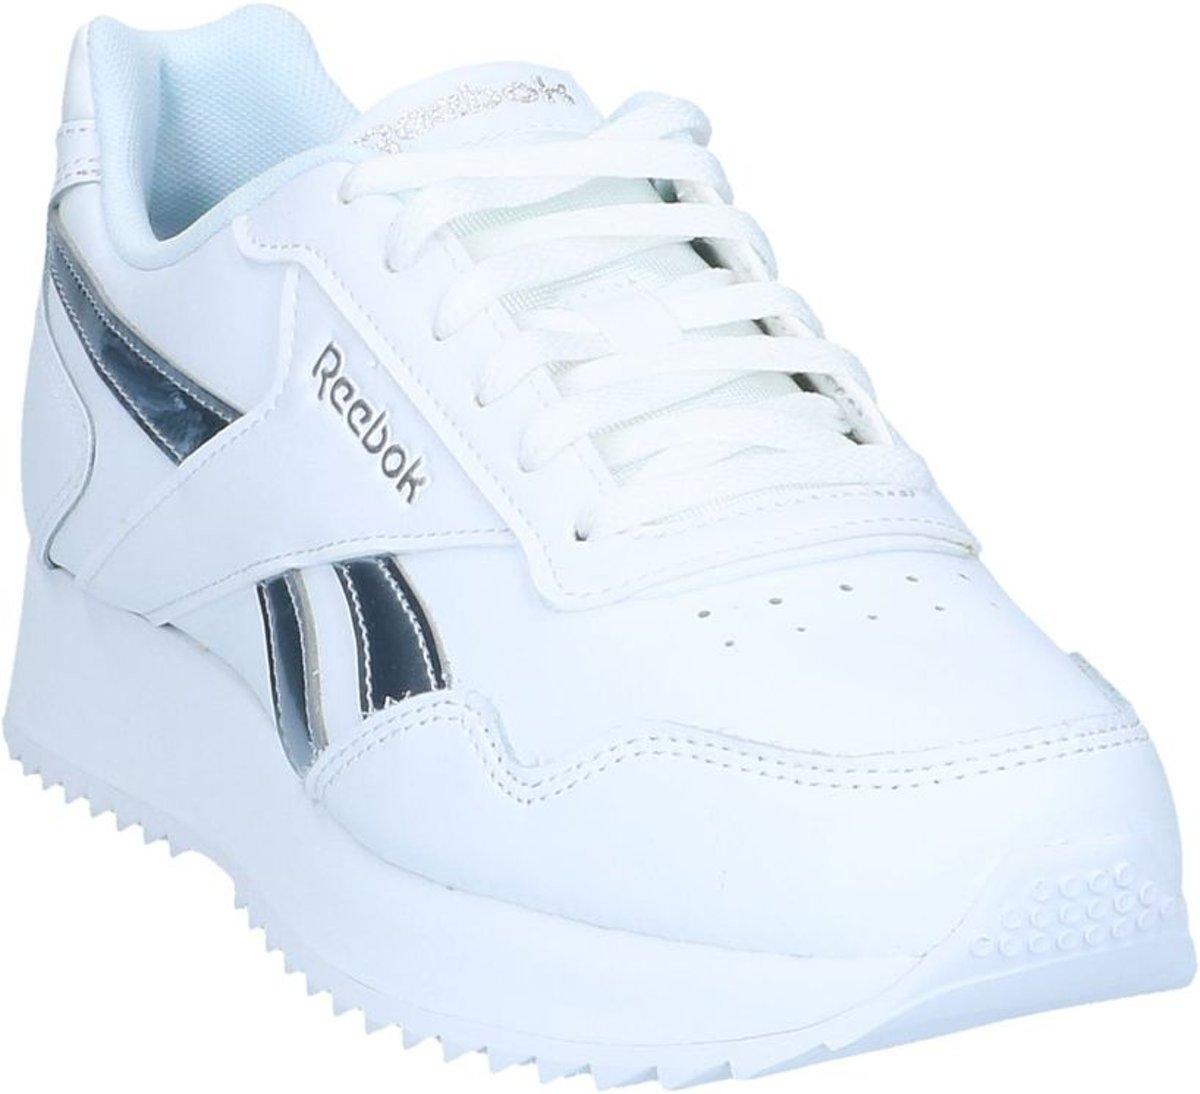 830918a0f4b bol.com | Witte Sneakers Reebok Royal Glide